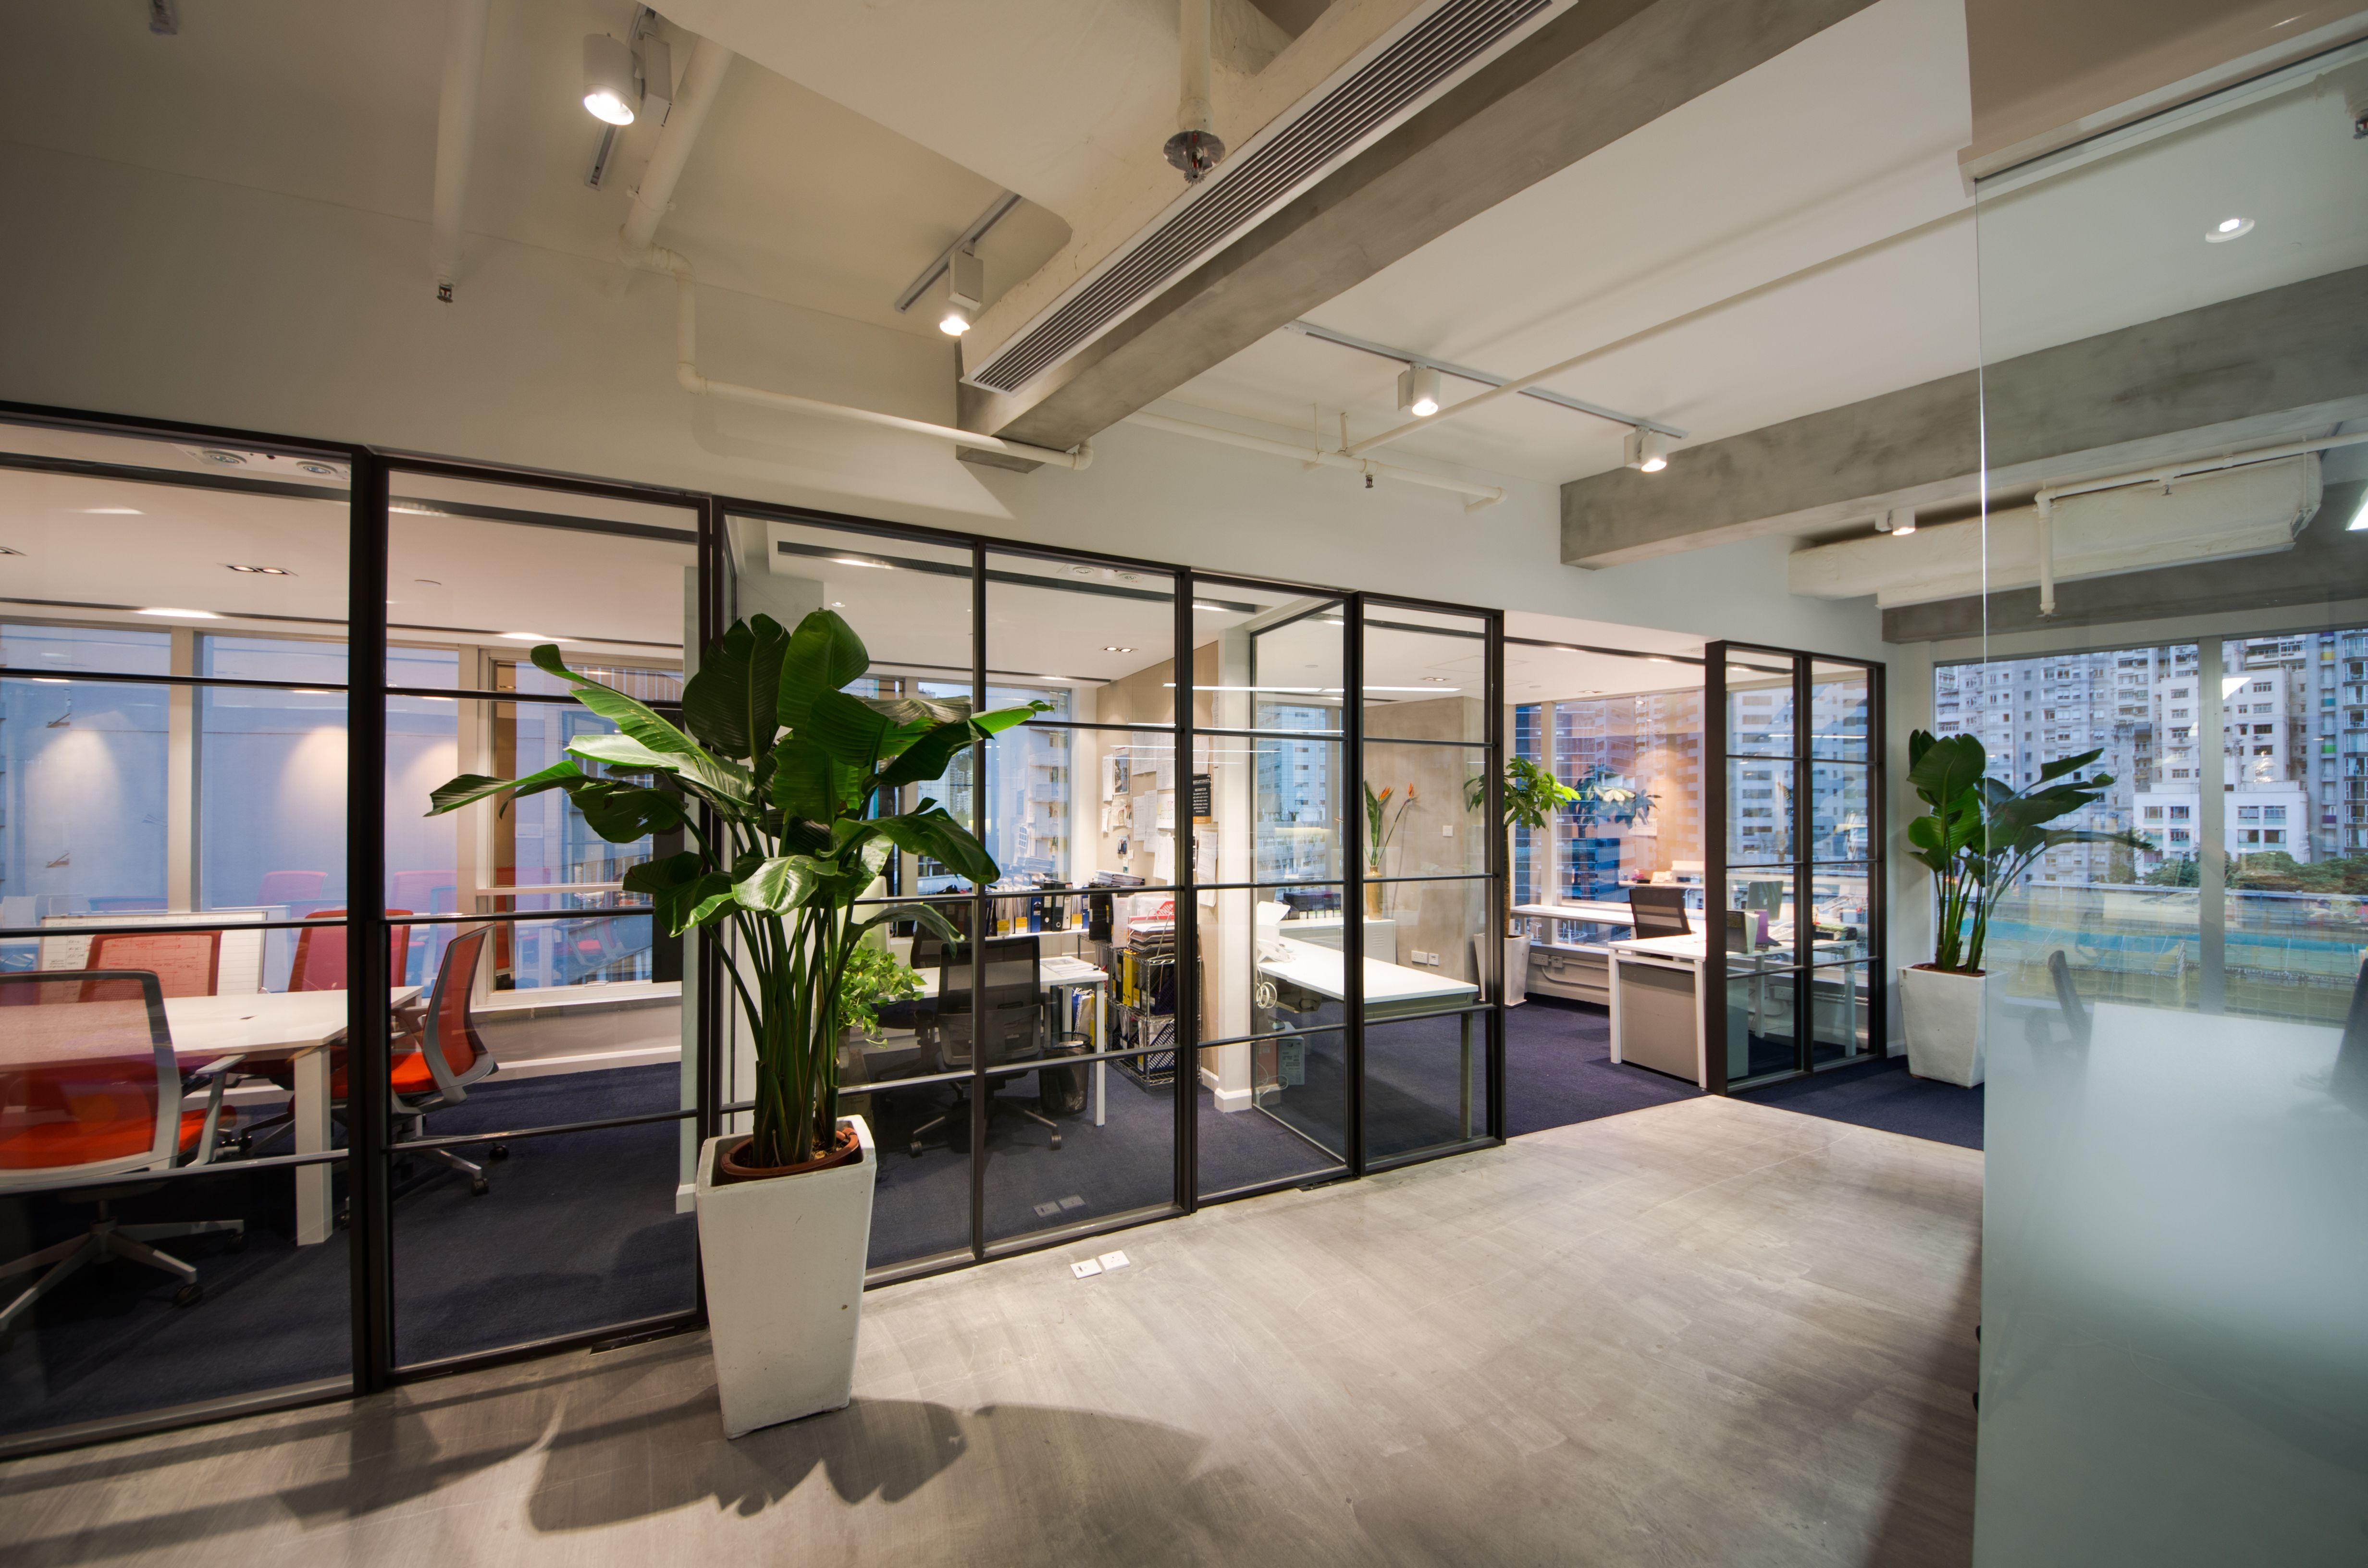 office space hong kong. Branding Office Space #branding #office #interiordesign #hongkong Hong Kong